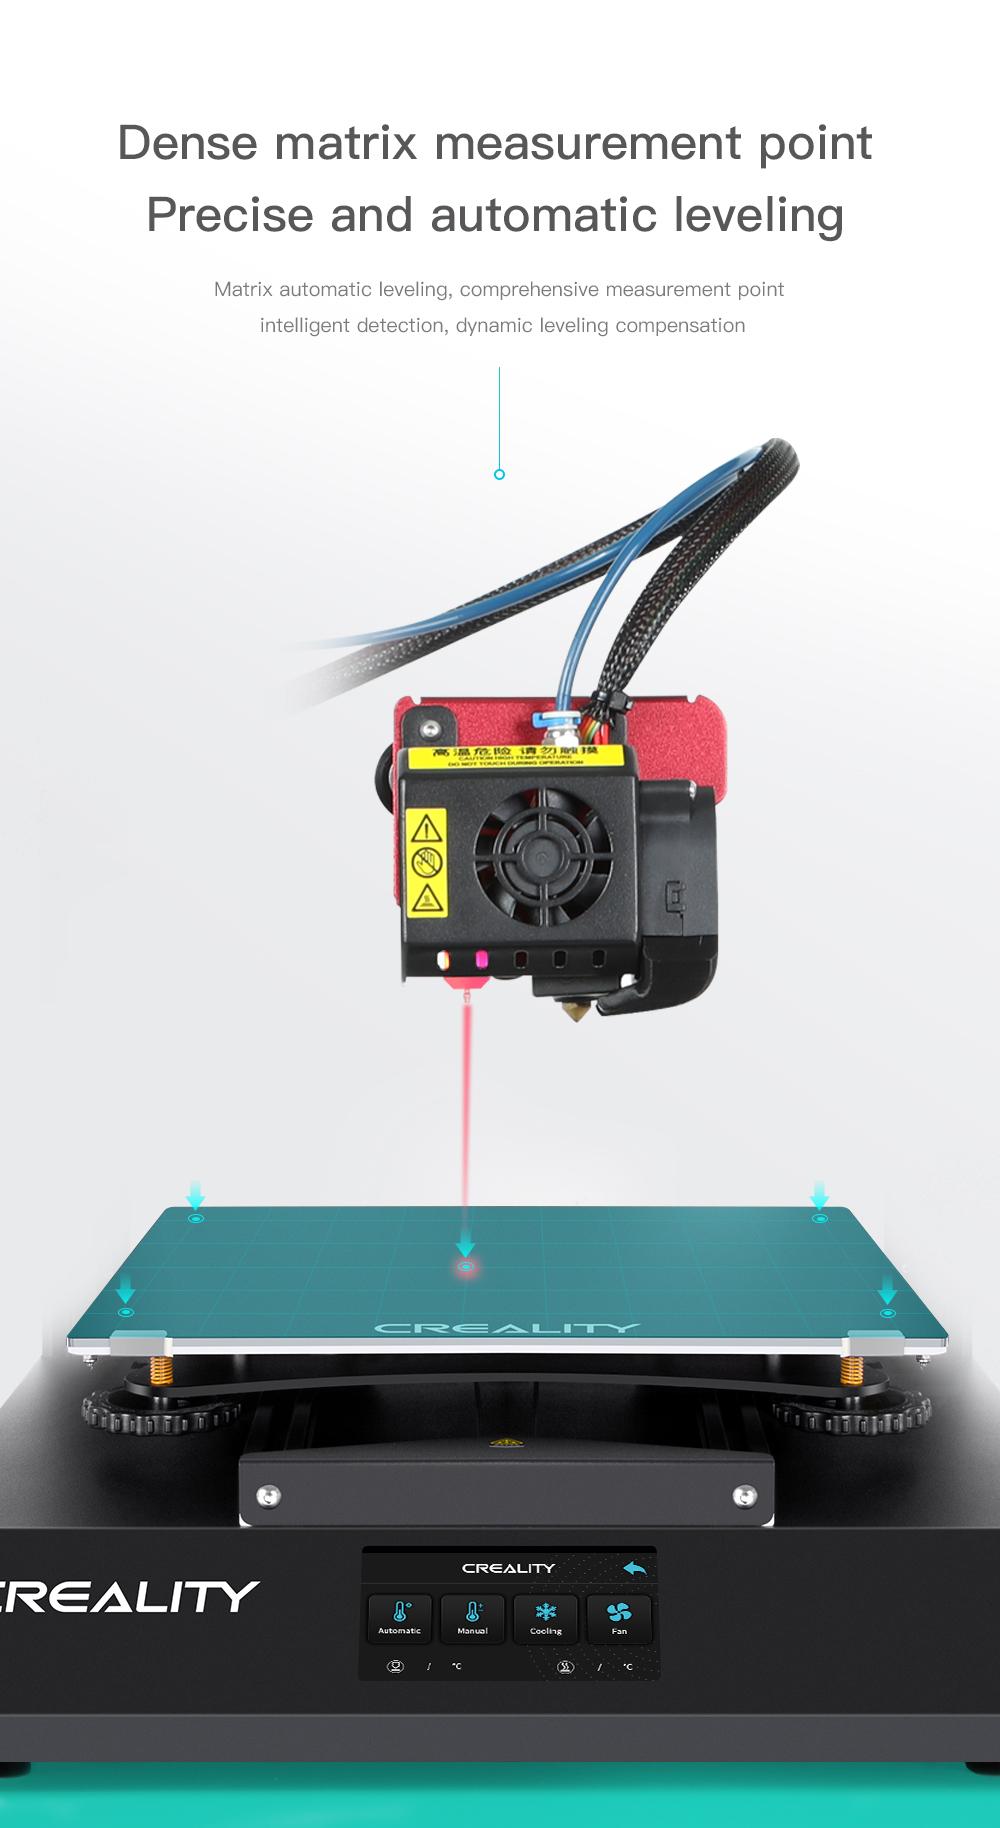 Creality3D CR-10S Pro V2 3D-Drucker Bausatz - 300x300x400mm - Automatisches Nivellieren